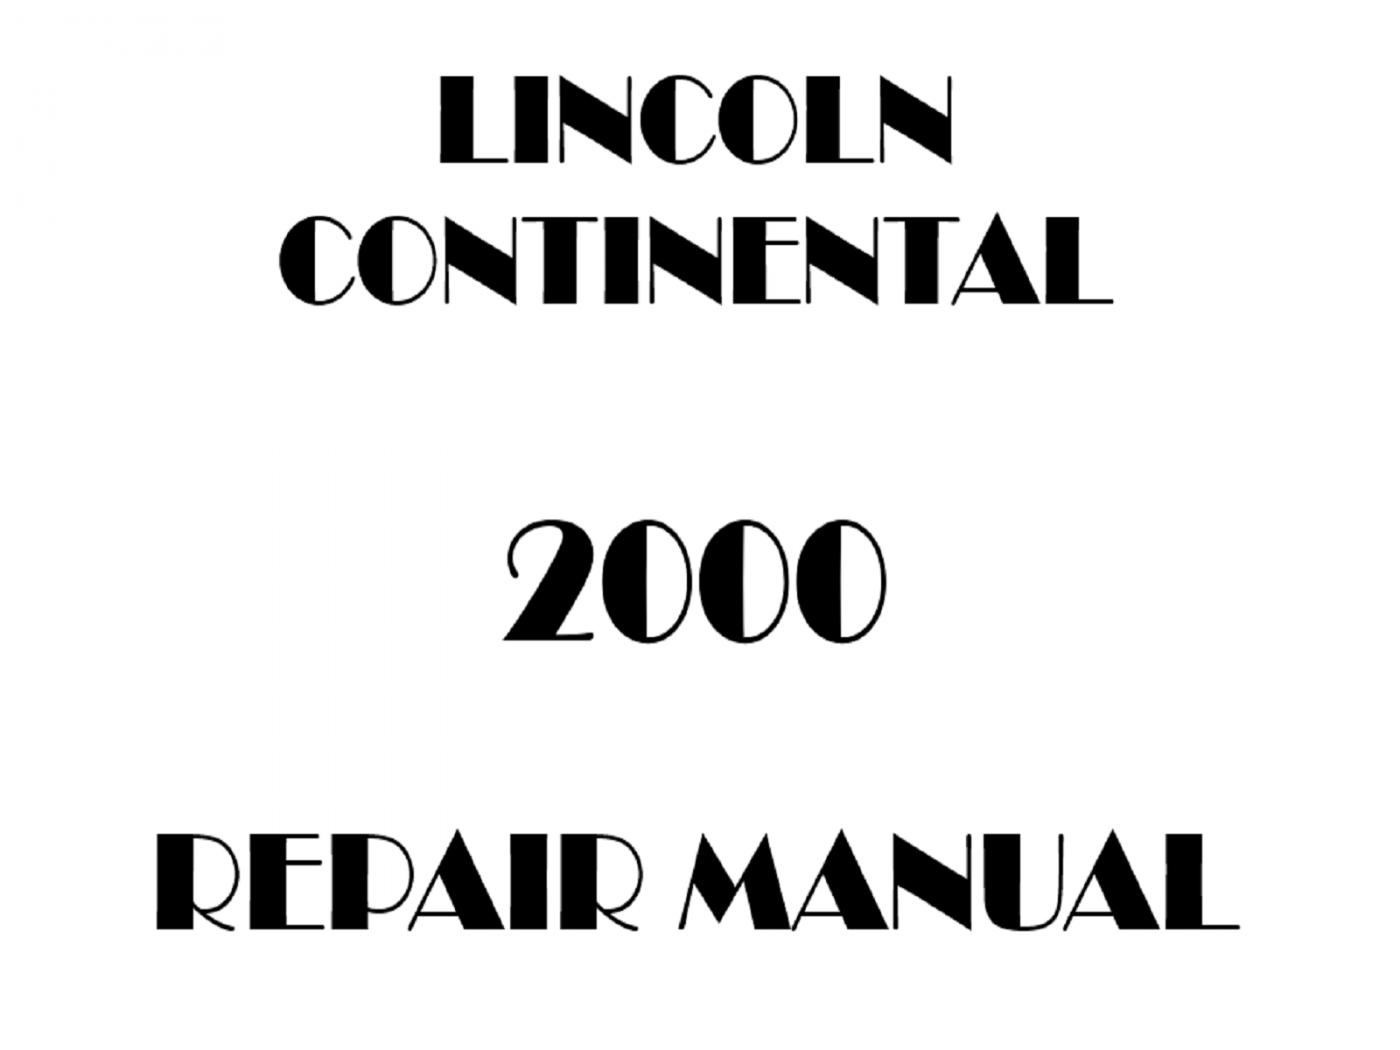 2000 Lincoln Continental repair manual